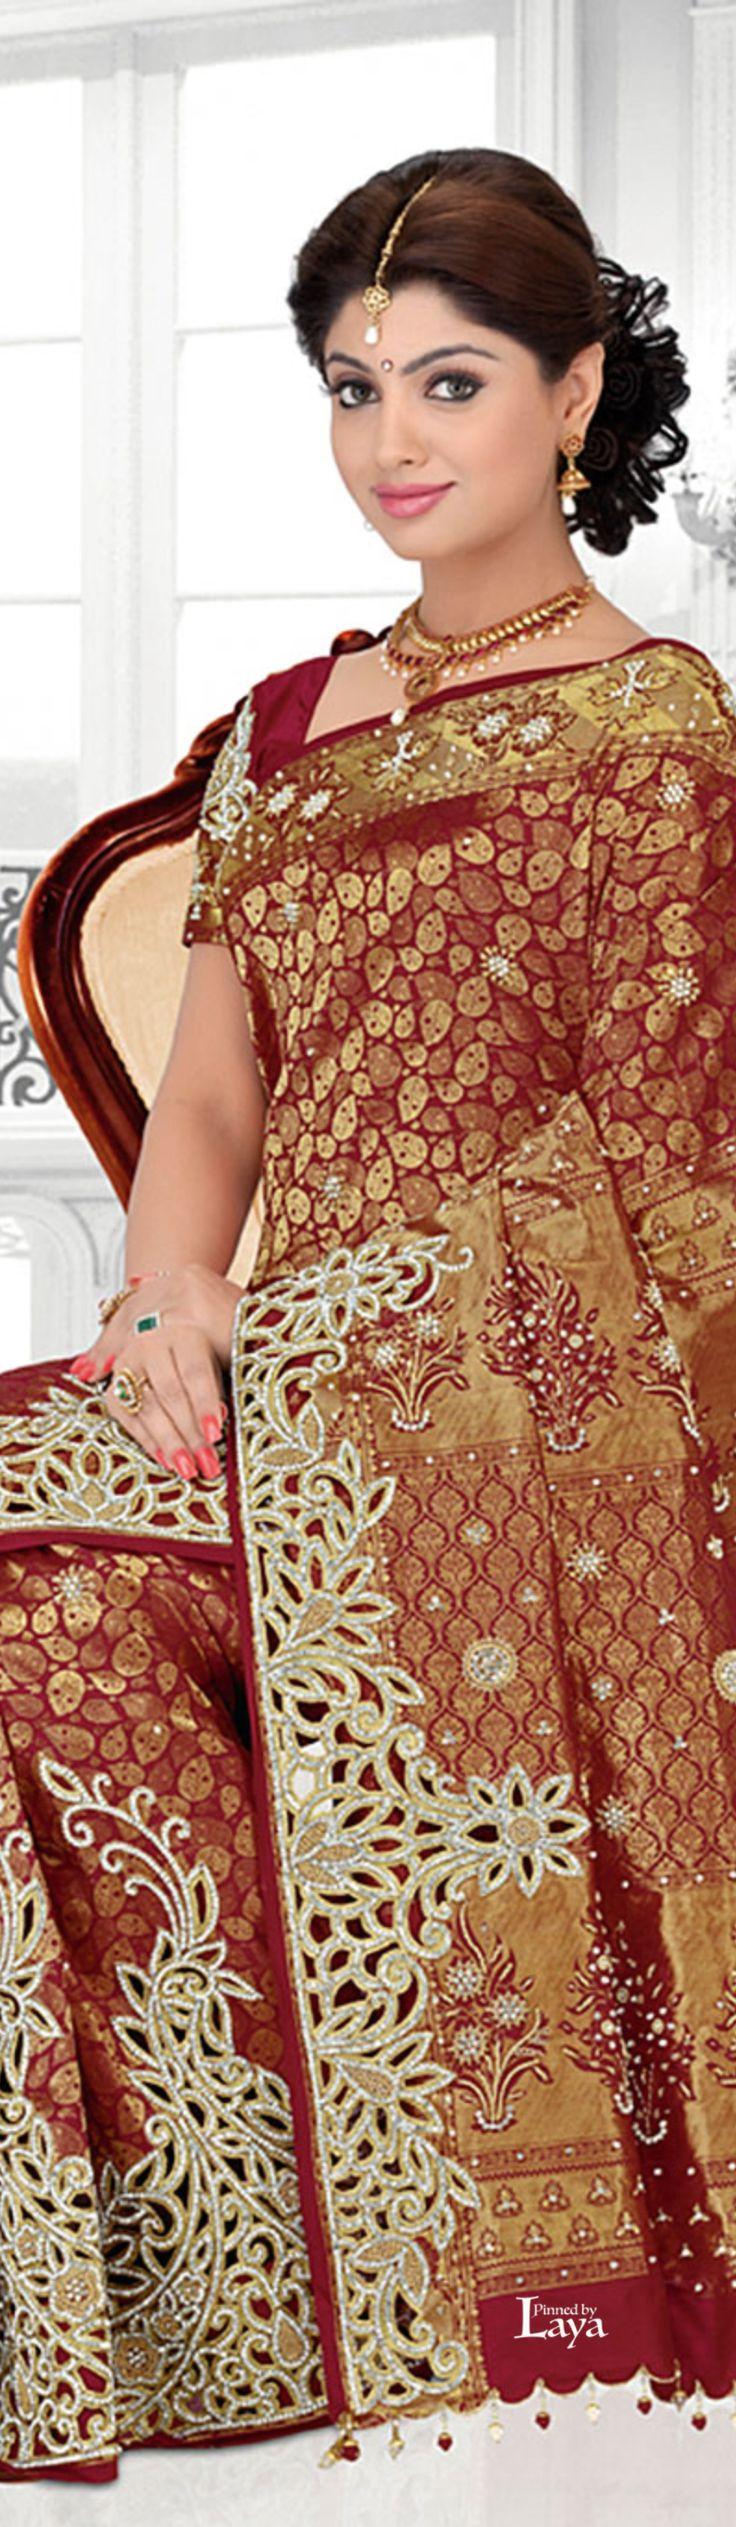 SOUTH India Fashions.✿*❋.